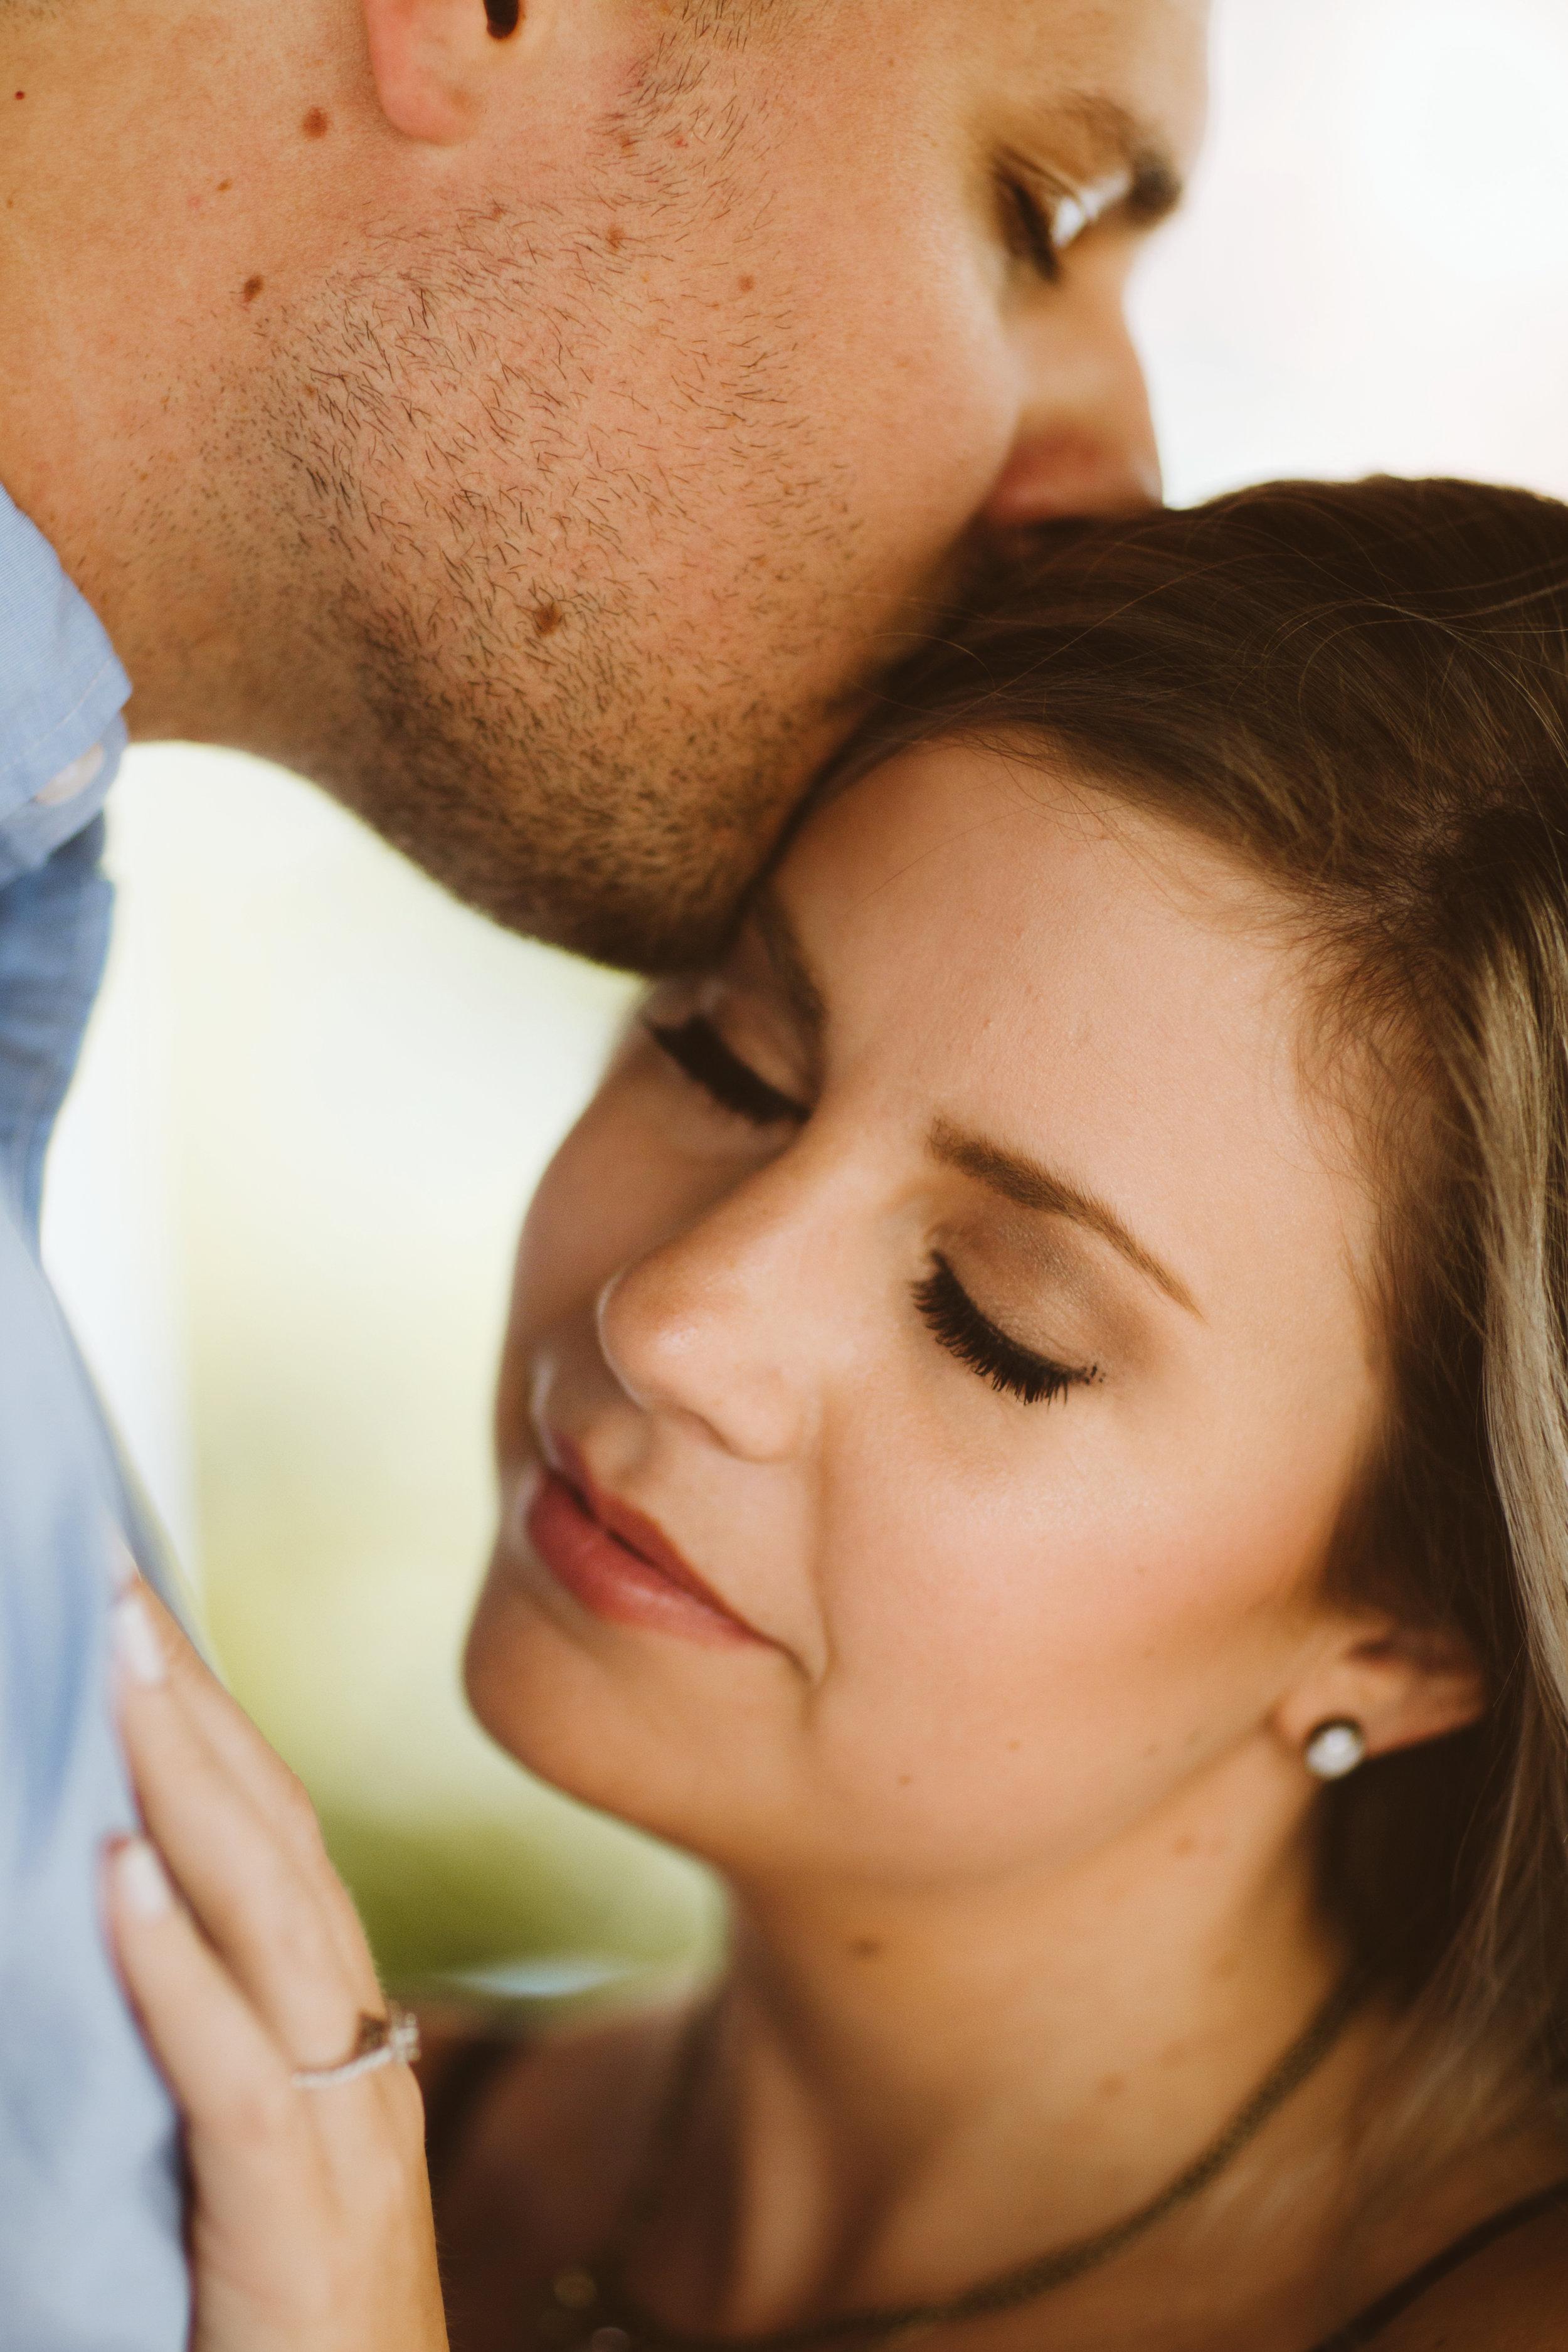 Engagement | Vanessa Boy Photography | vanessaboy.com |-7-2.com |final .jpg